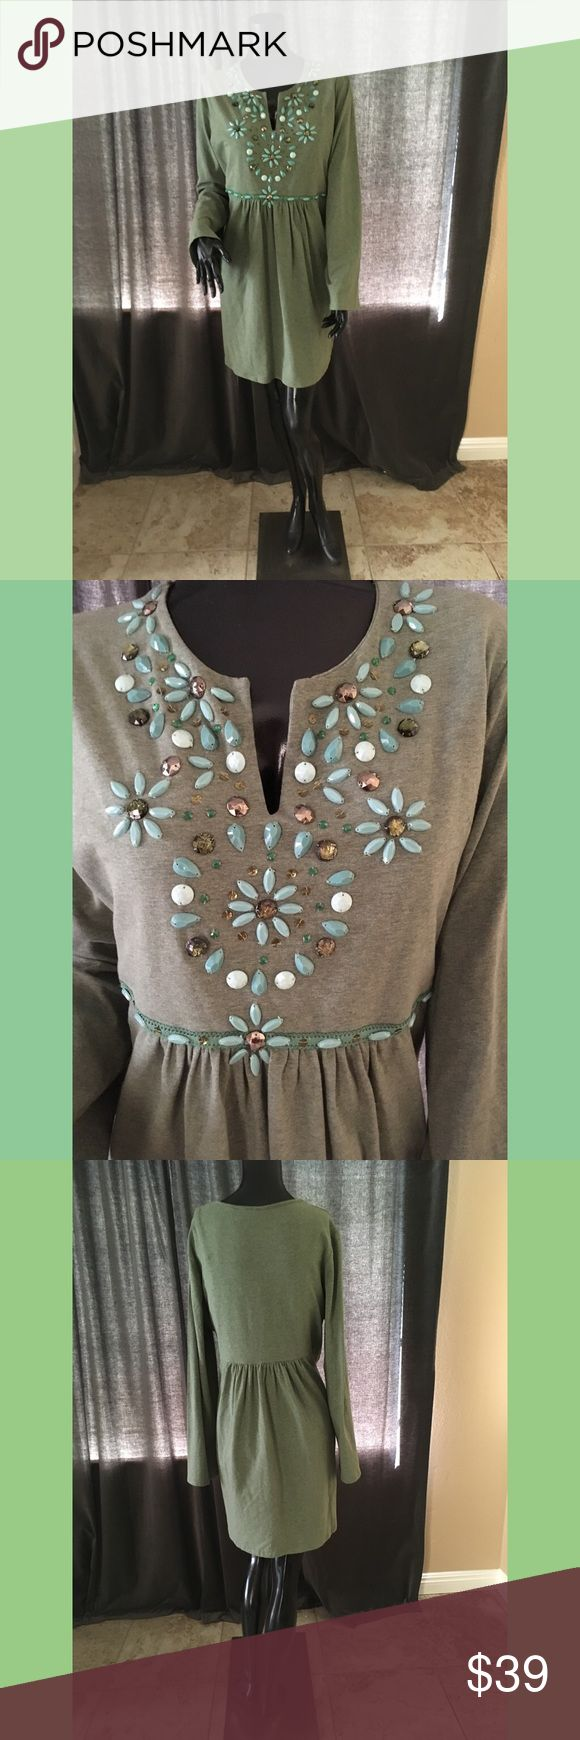 Long-sleeved, embellished tunic dress Green, long-sleeved tunic dress with jewel and sequin embellishment on front. Diane Gilman Dresses Long Sleeve